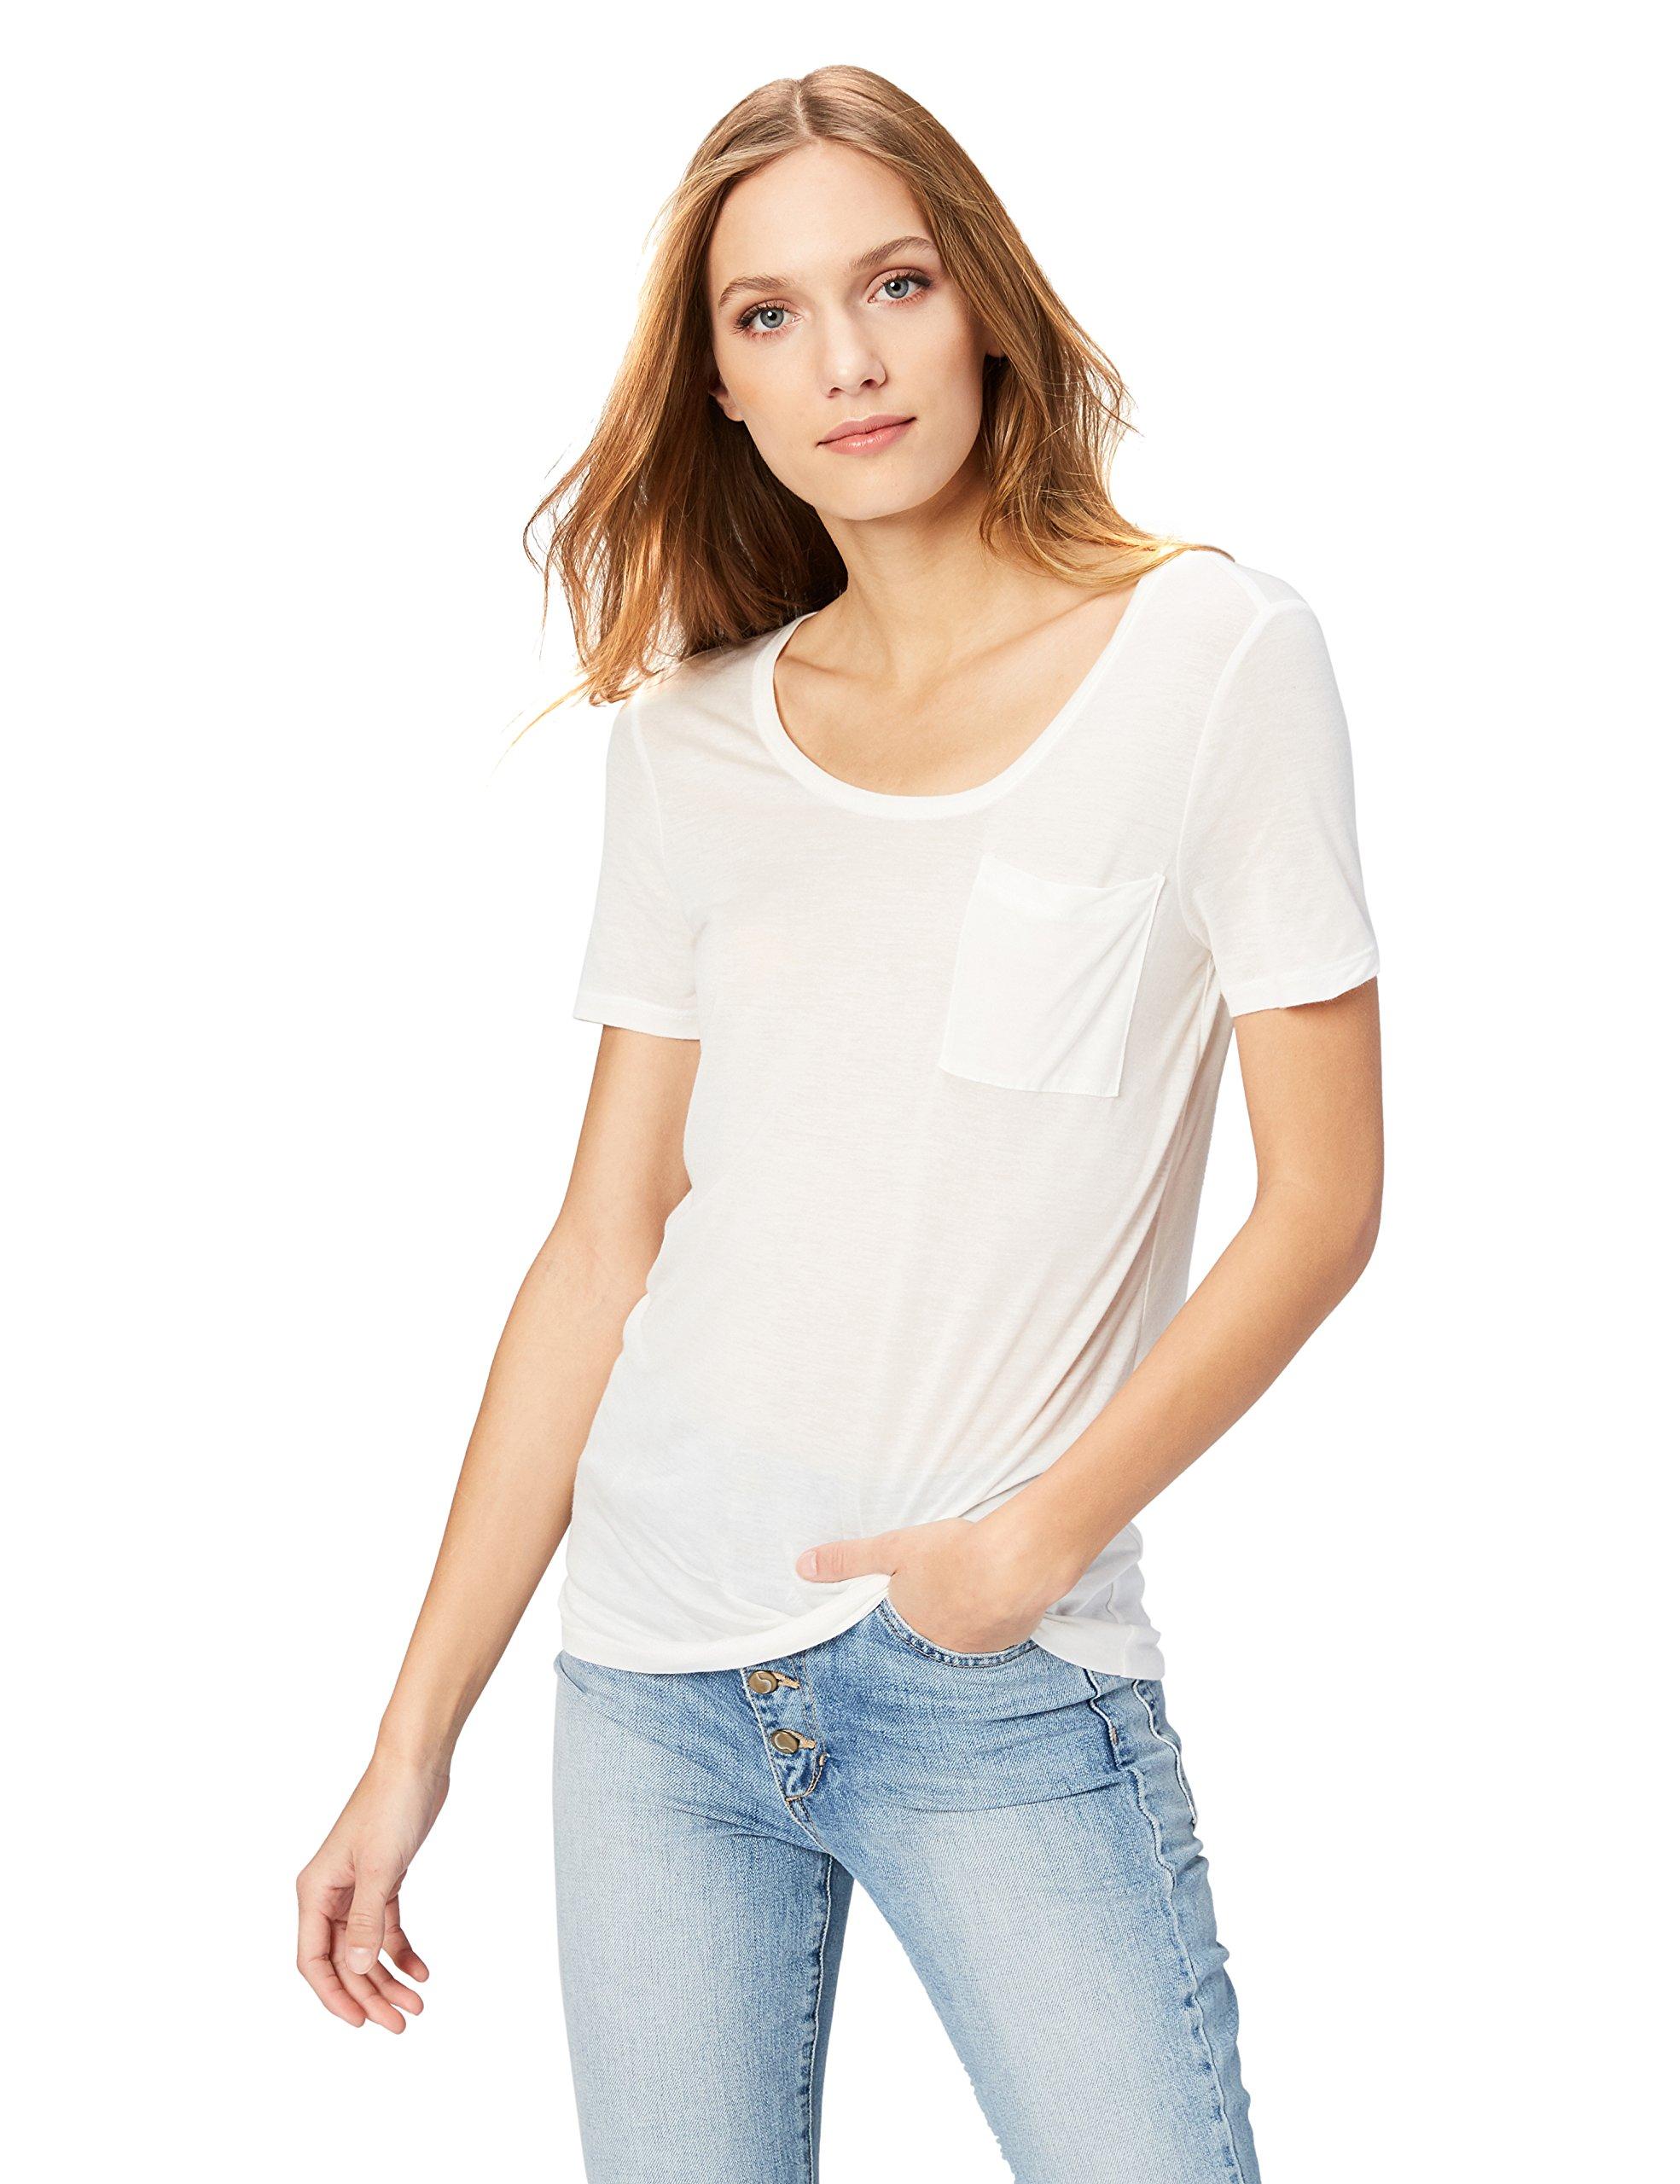 Daily Ritual Women's Super Soft Modal Semi-Sheer Pocket T-Shirt, M, Winter White